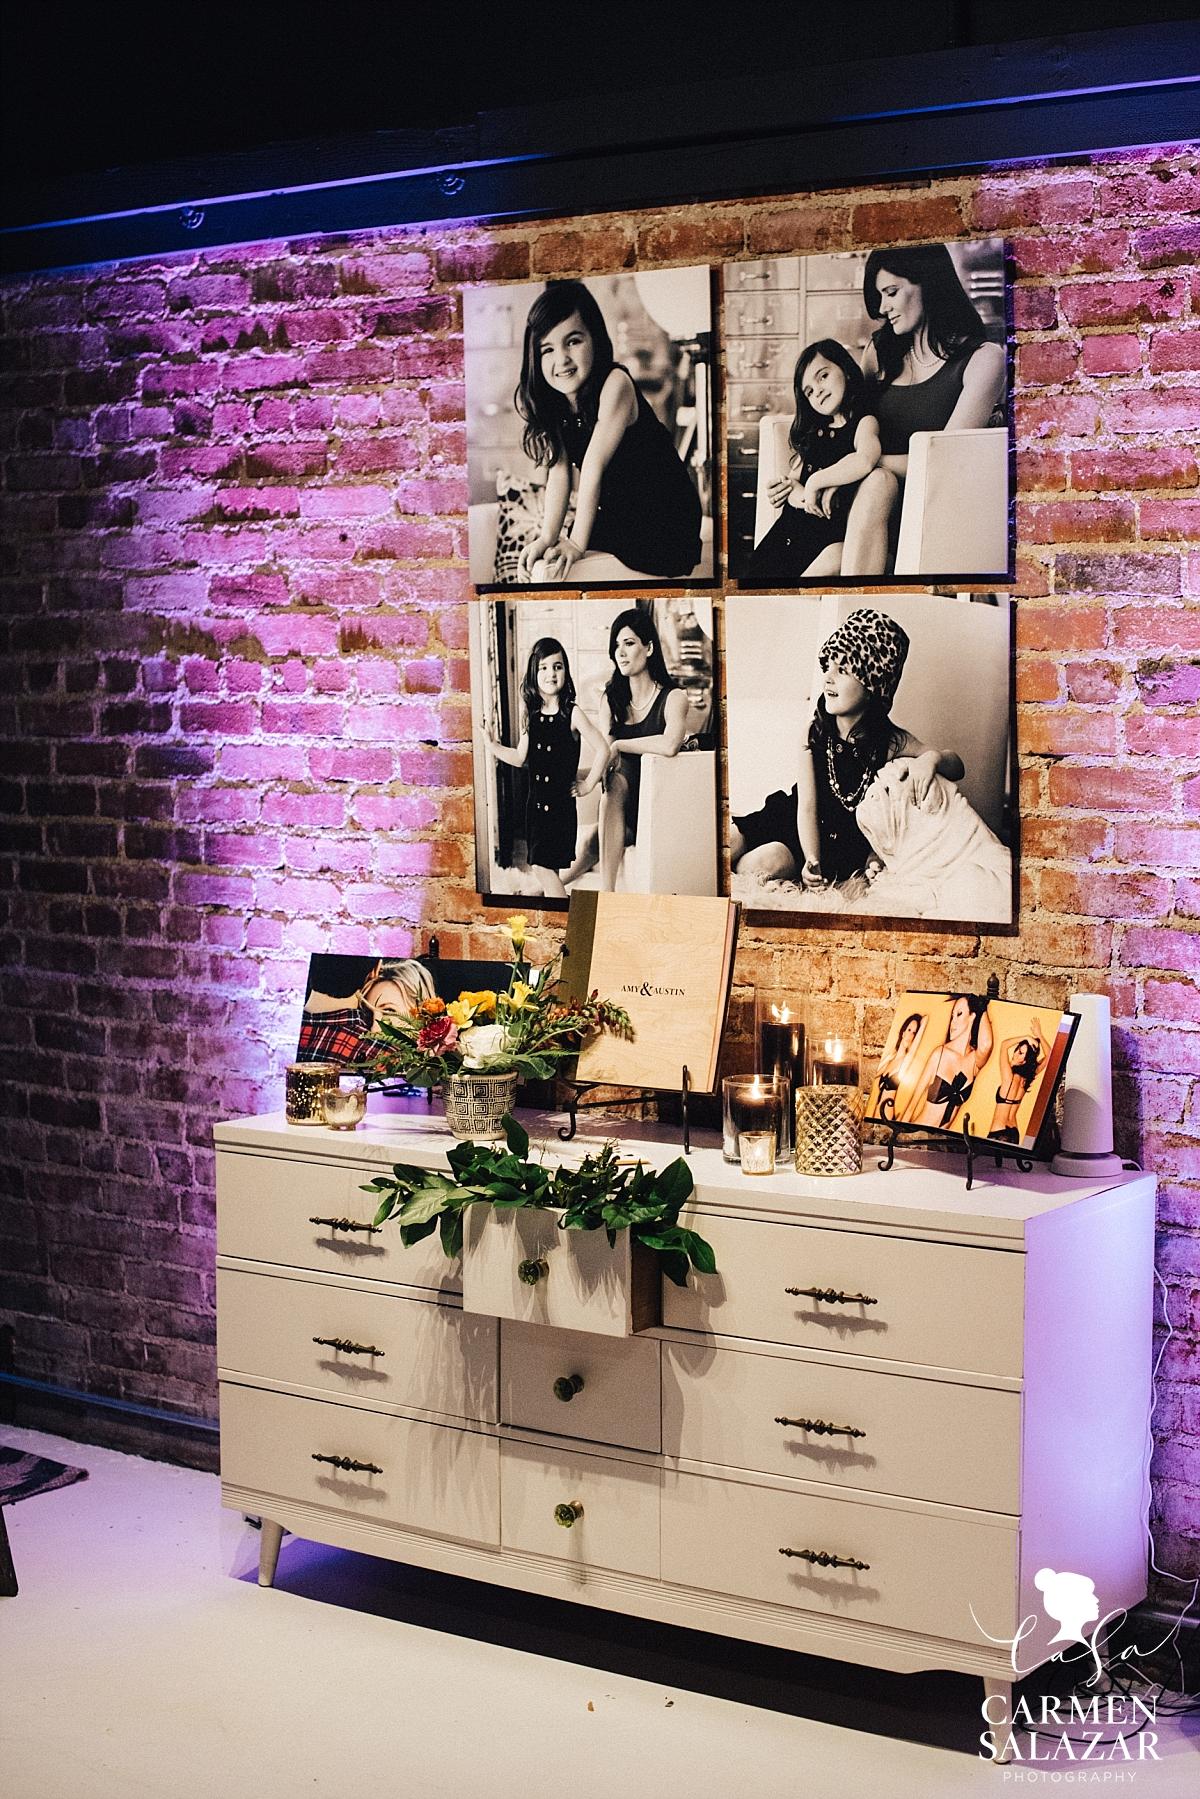 New photography studio in Roseville grand opening - Carmen Salazar